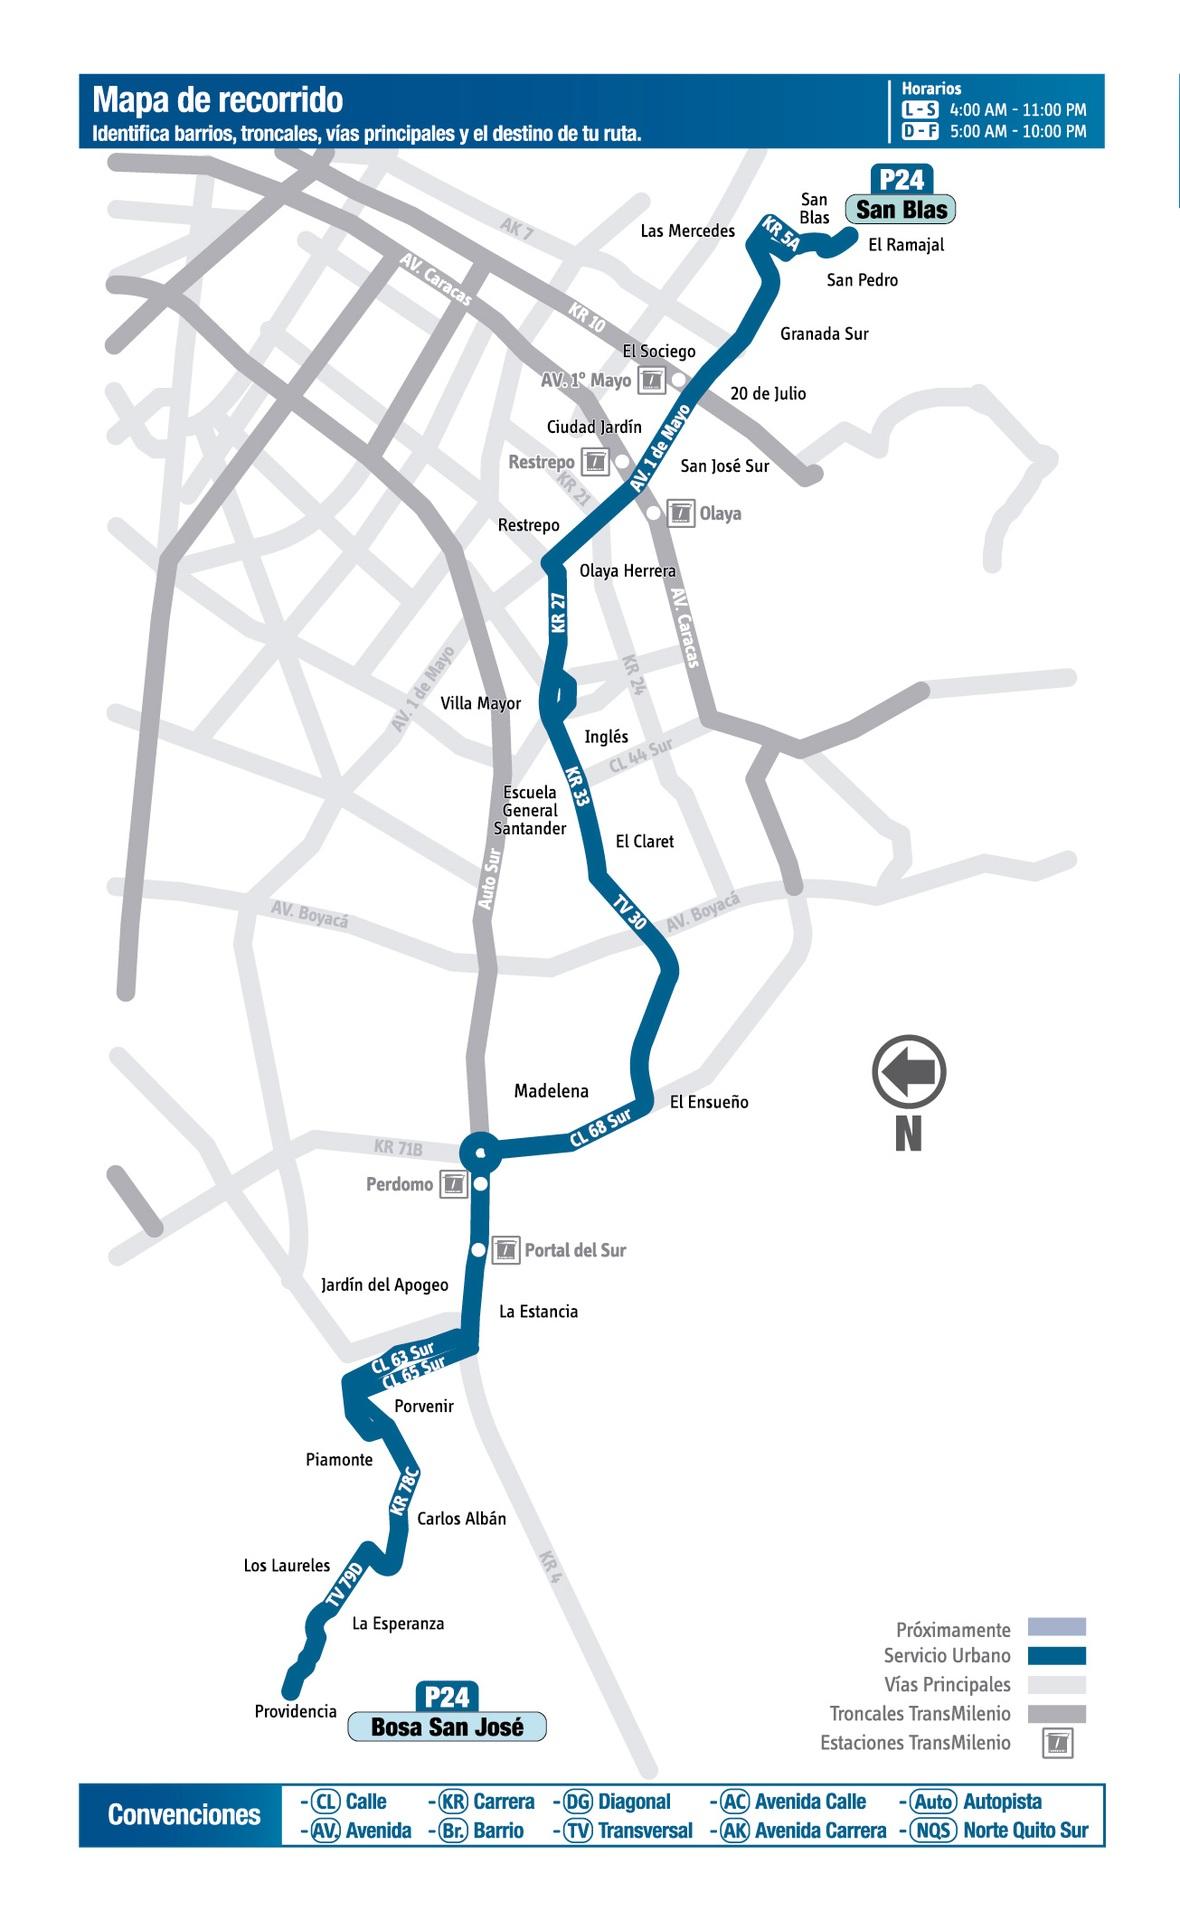 Ruta SITP: P24 Charles de Gaulle ↔ San Blas [Urbana]